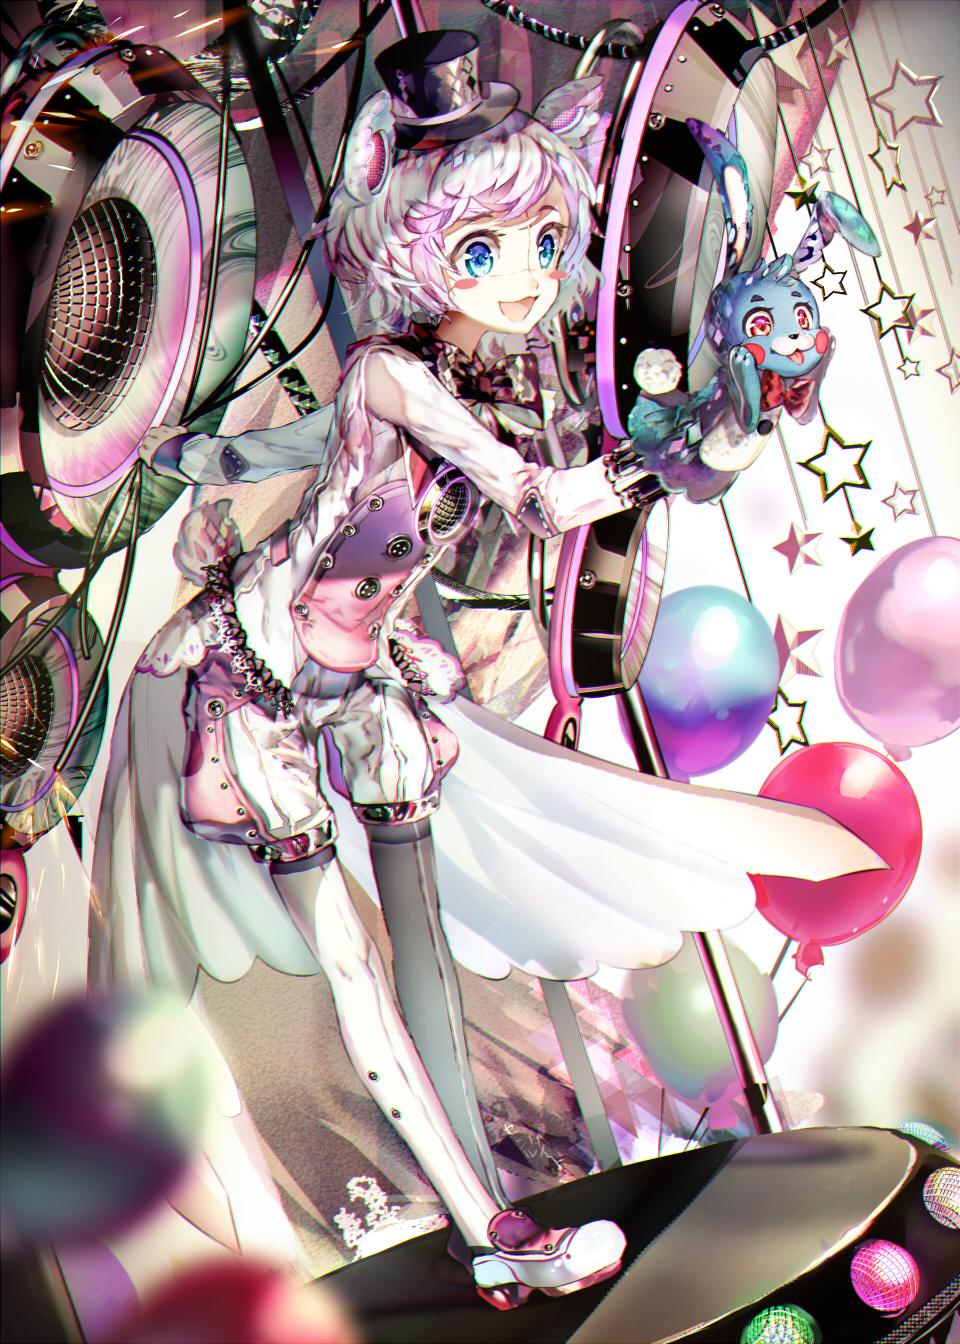 Tags Anime Irineiji Sister Location Funtime Freddy Rabbit Toy Speaker